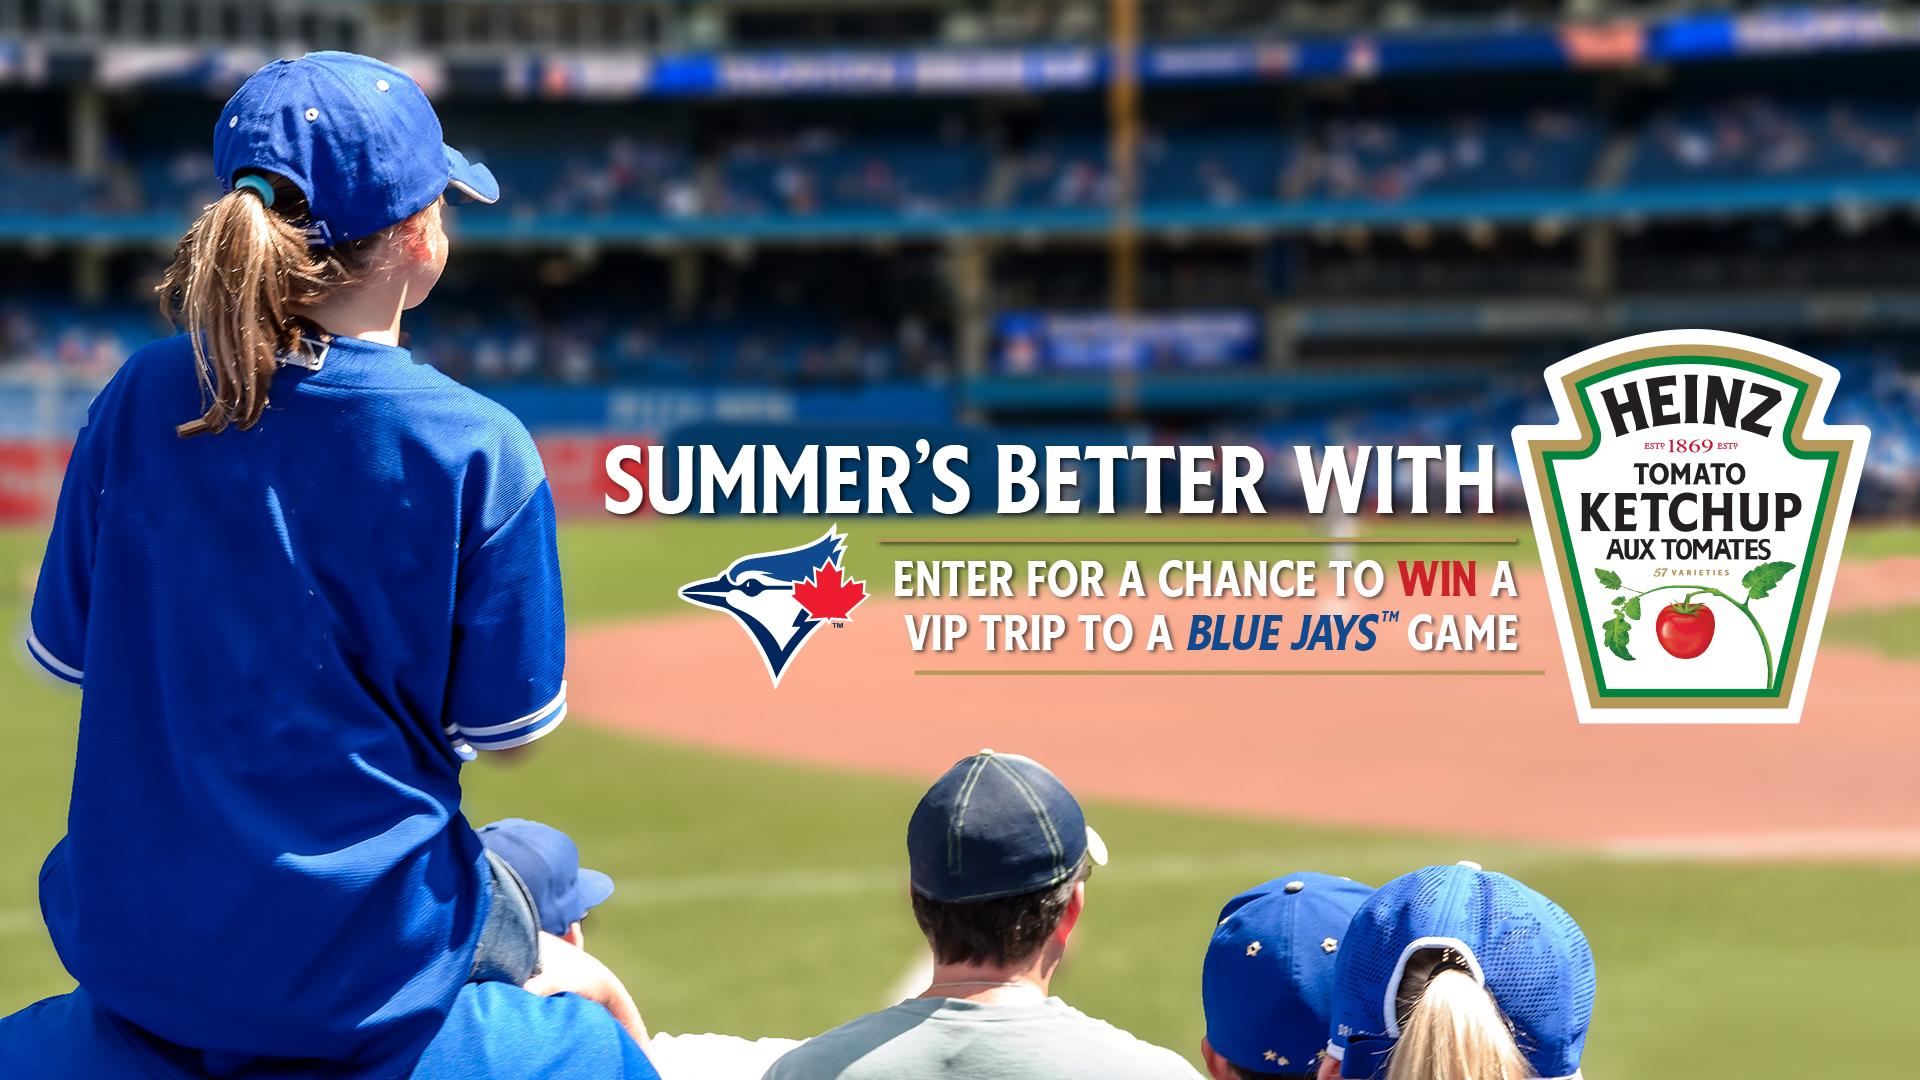 Heinz Summer's Better with Baseball Contest